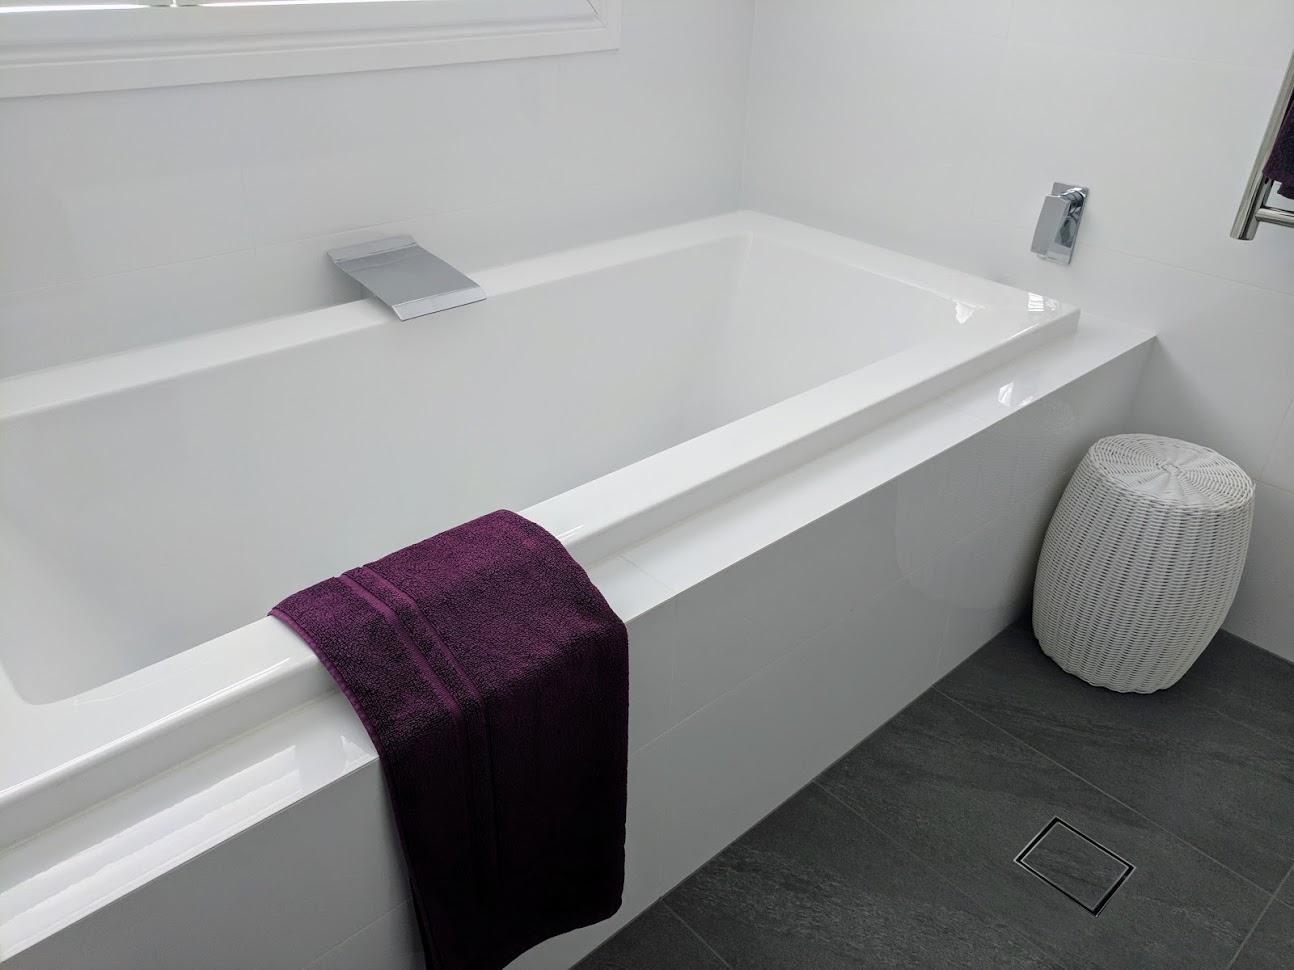 bathroom renovations sydney 2. sydney bathroom renovation renovations 2 a